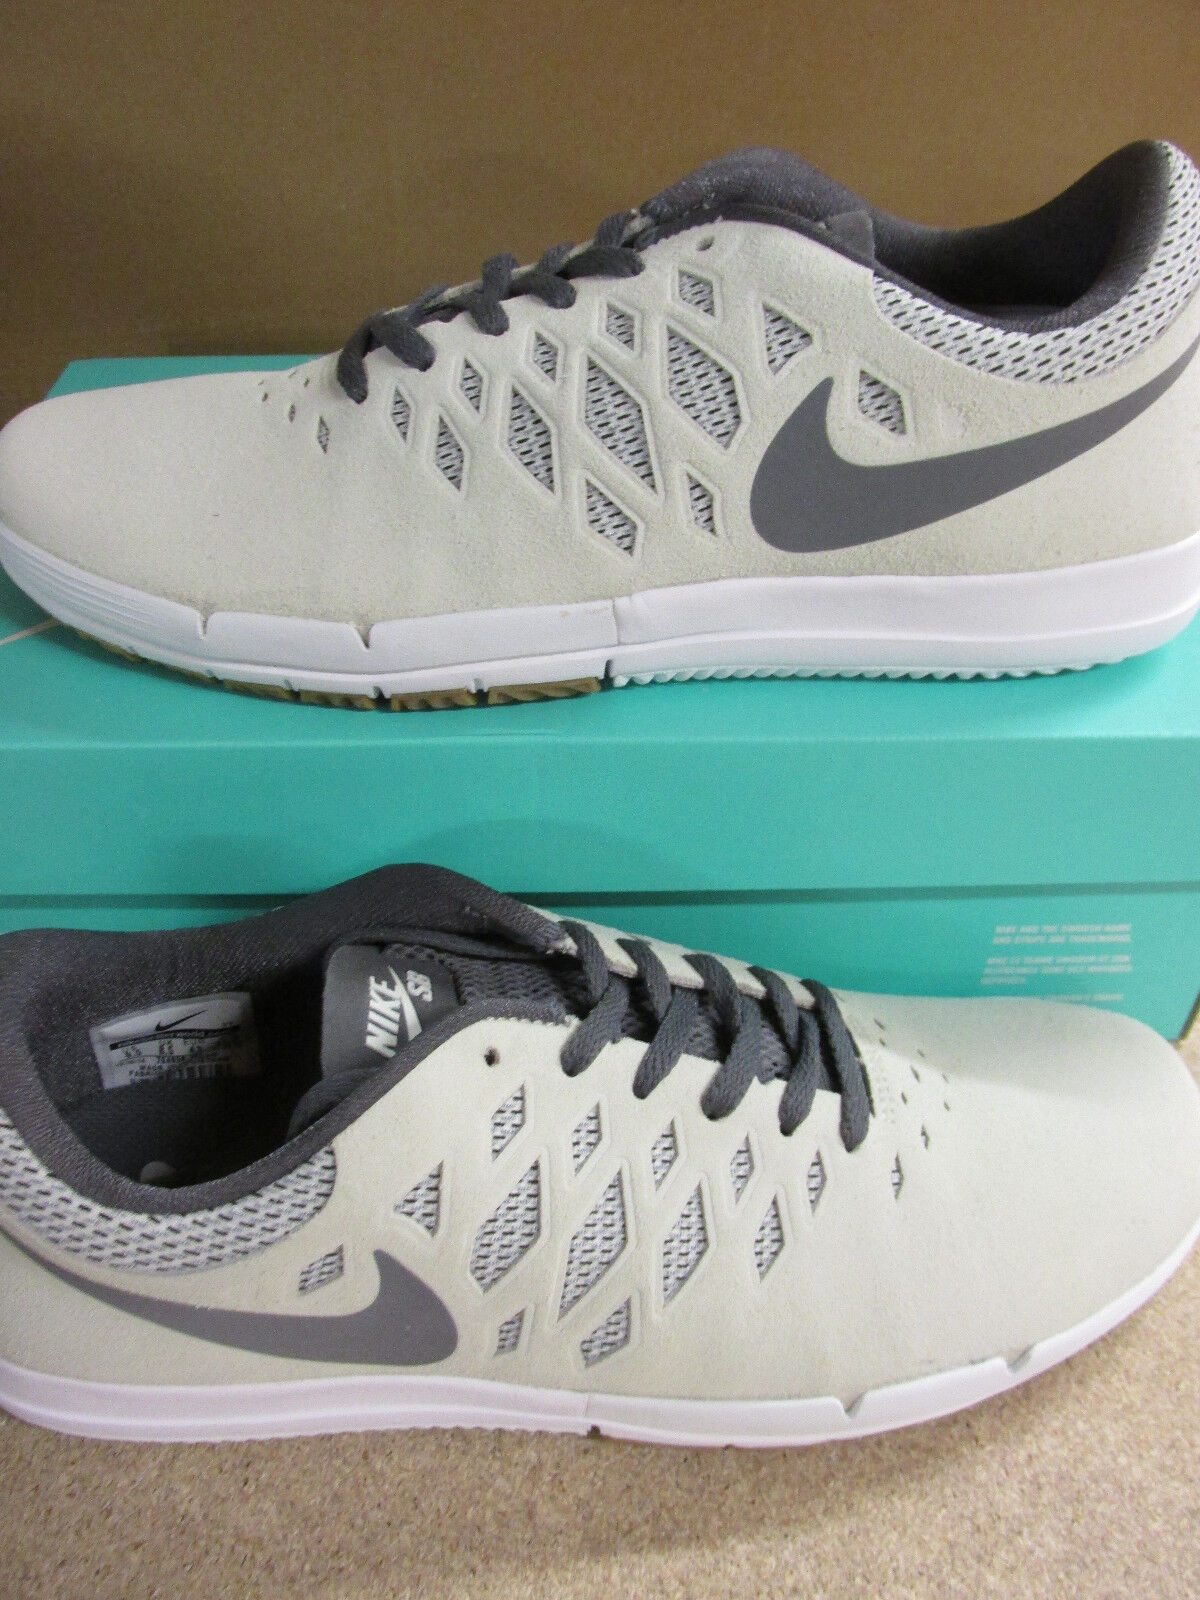 Nike free trainers SB mens trainers free 704936 101 Turnschuhe schuhe f74240